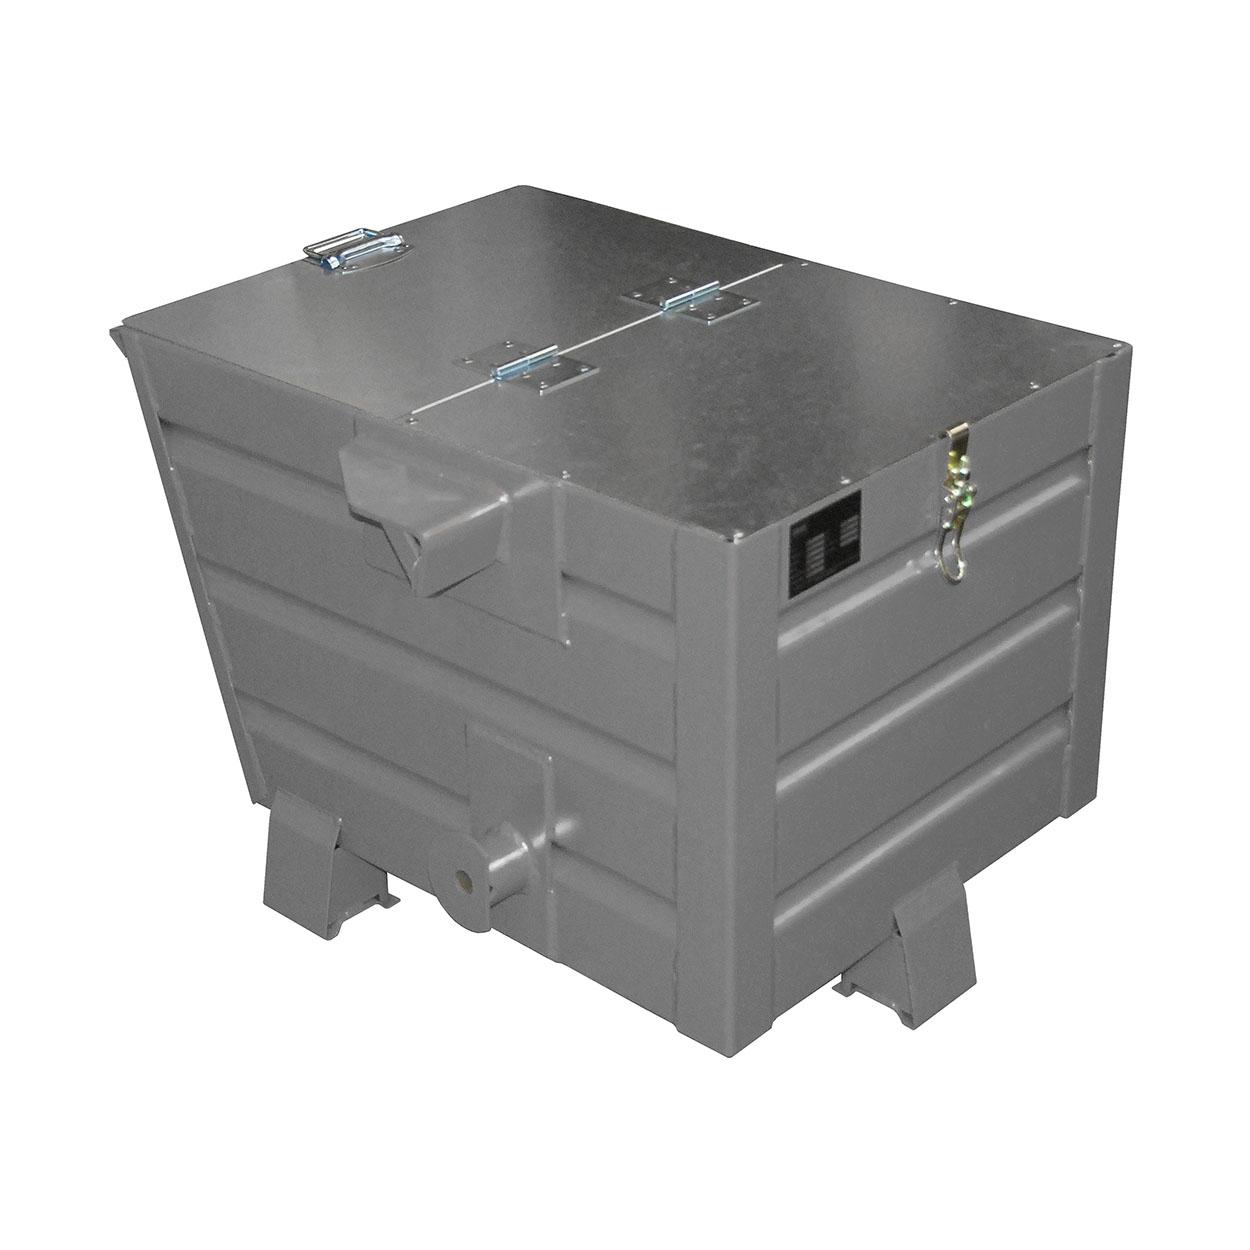 Výklopný kontejner TRV s víkem